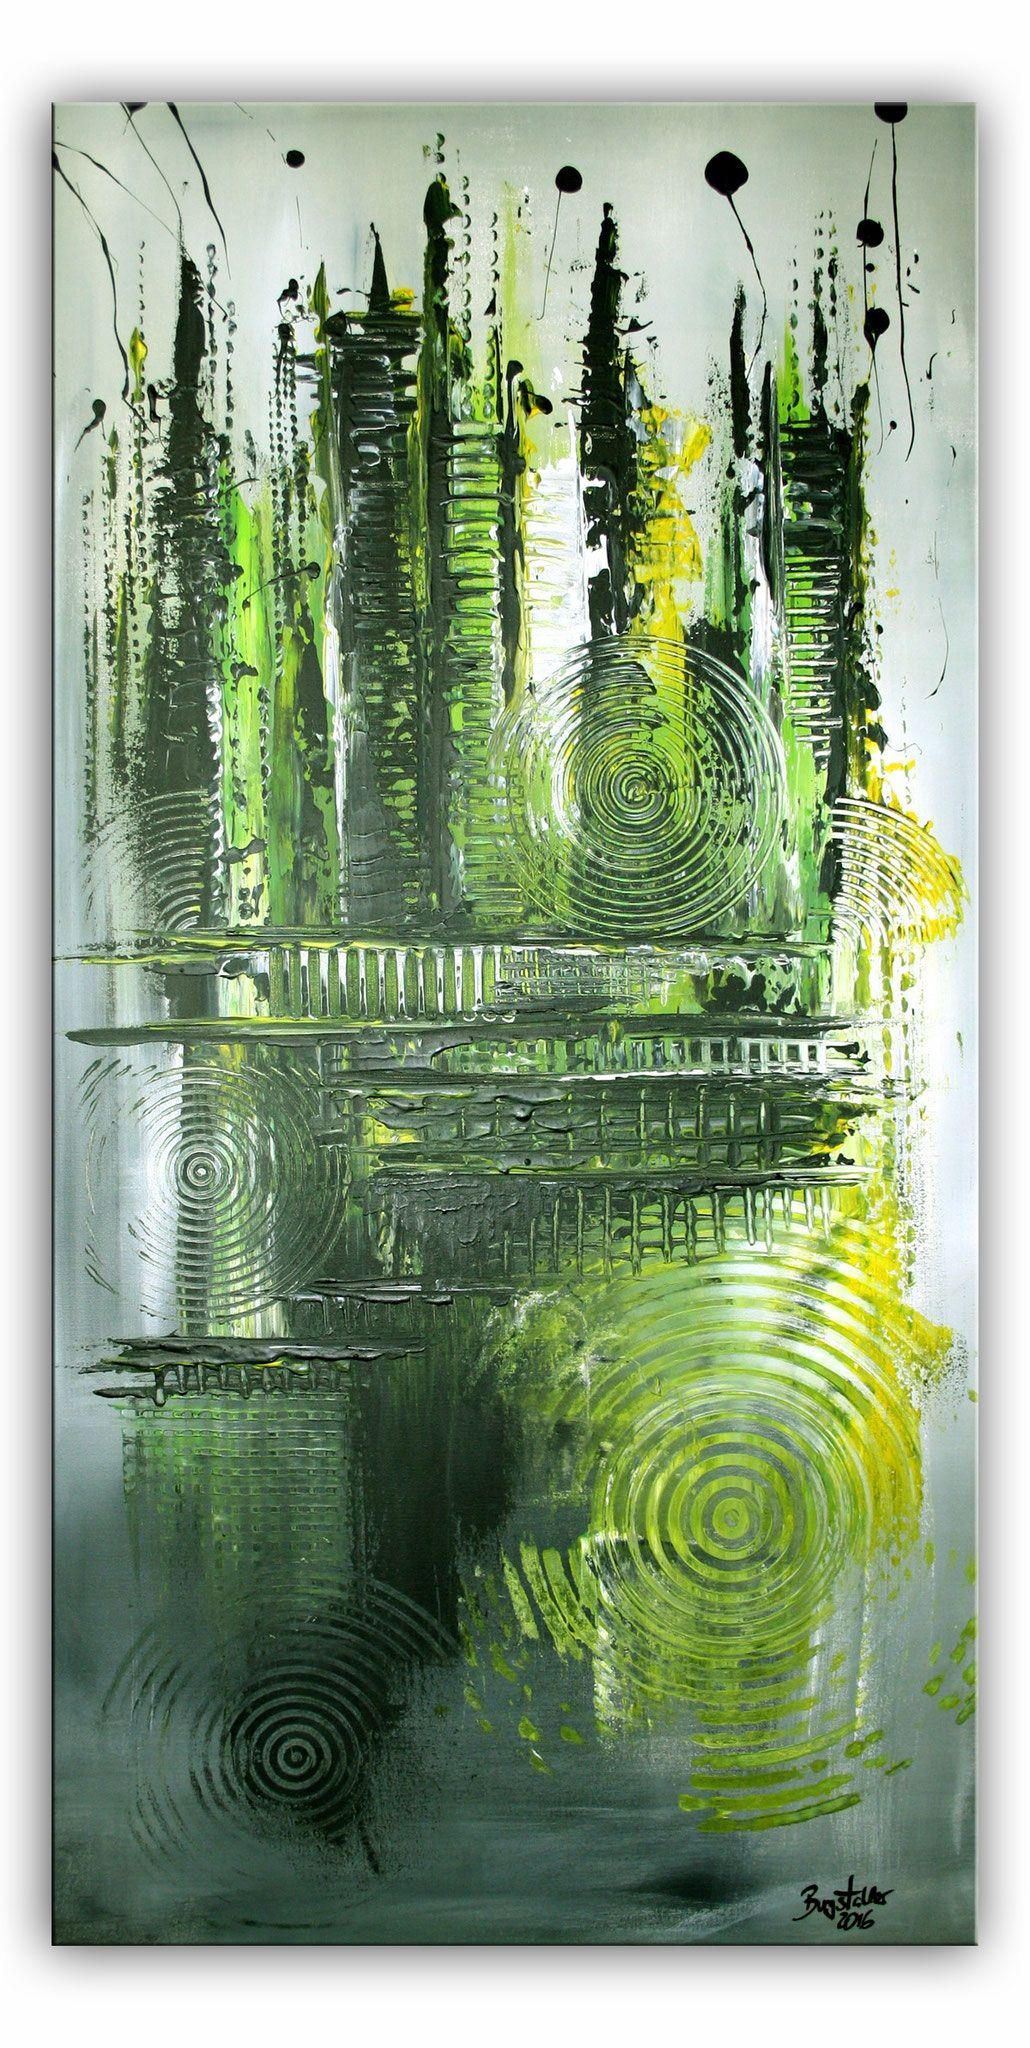 223 verkaufte abstrakte malerei grun hochformat wandbilder original gemalde kunst kunstwerke unikate abstrakt acryl paul klee